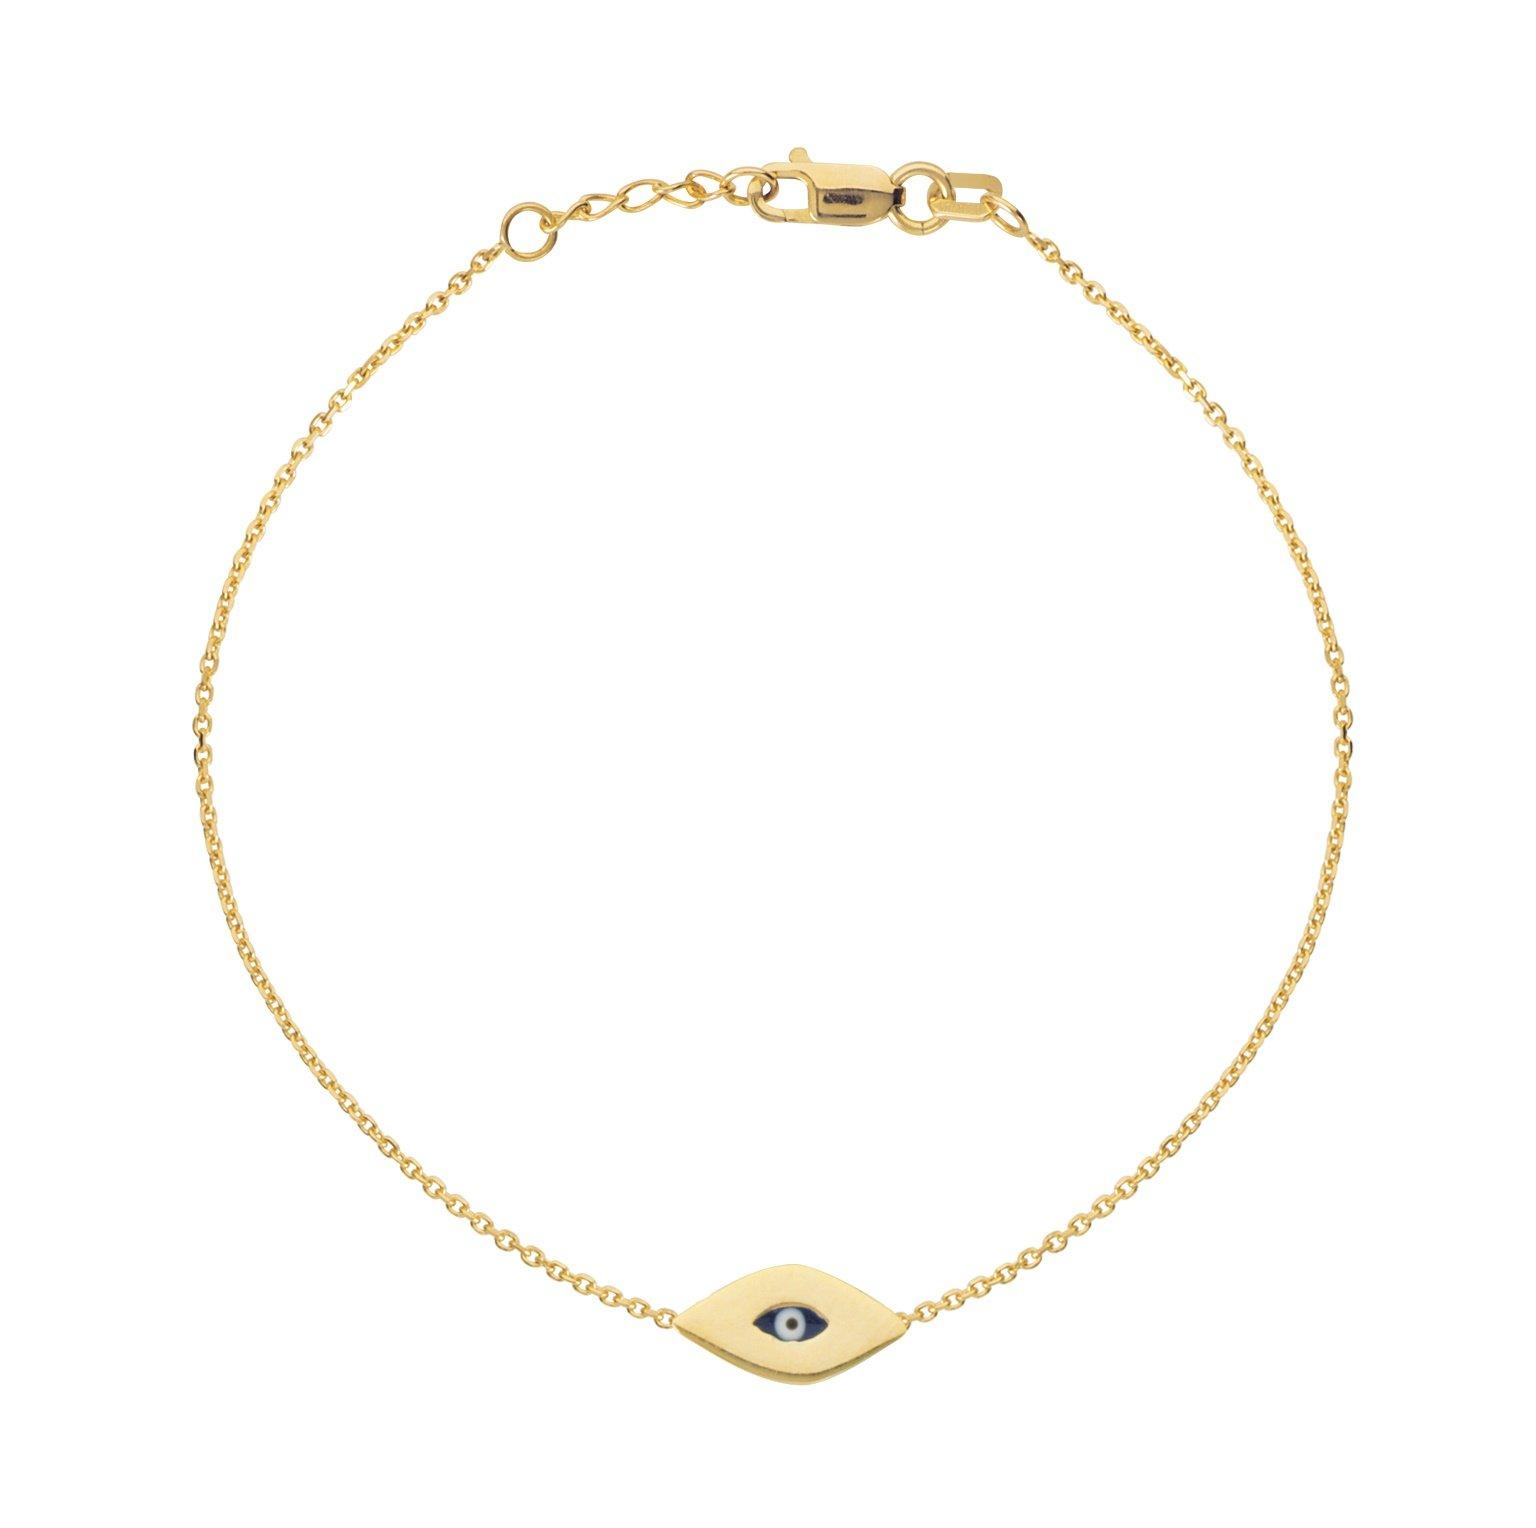 Ritastephens 14k Solid Yellow Gold Mini Evil Eye Good Luck Charm Bracelet Adjustable 7-7.5 Inches by Ritastephens